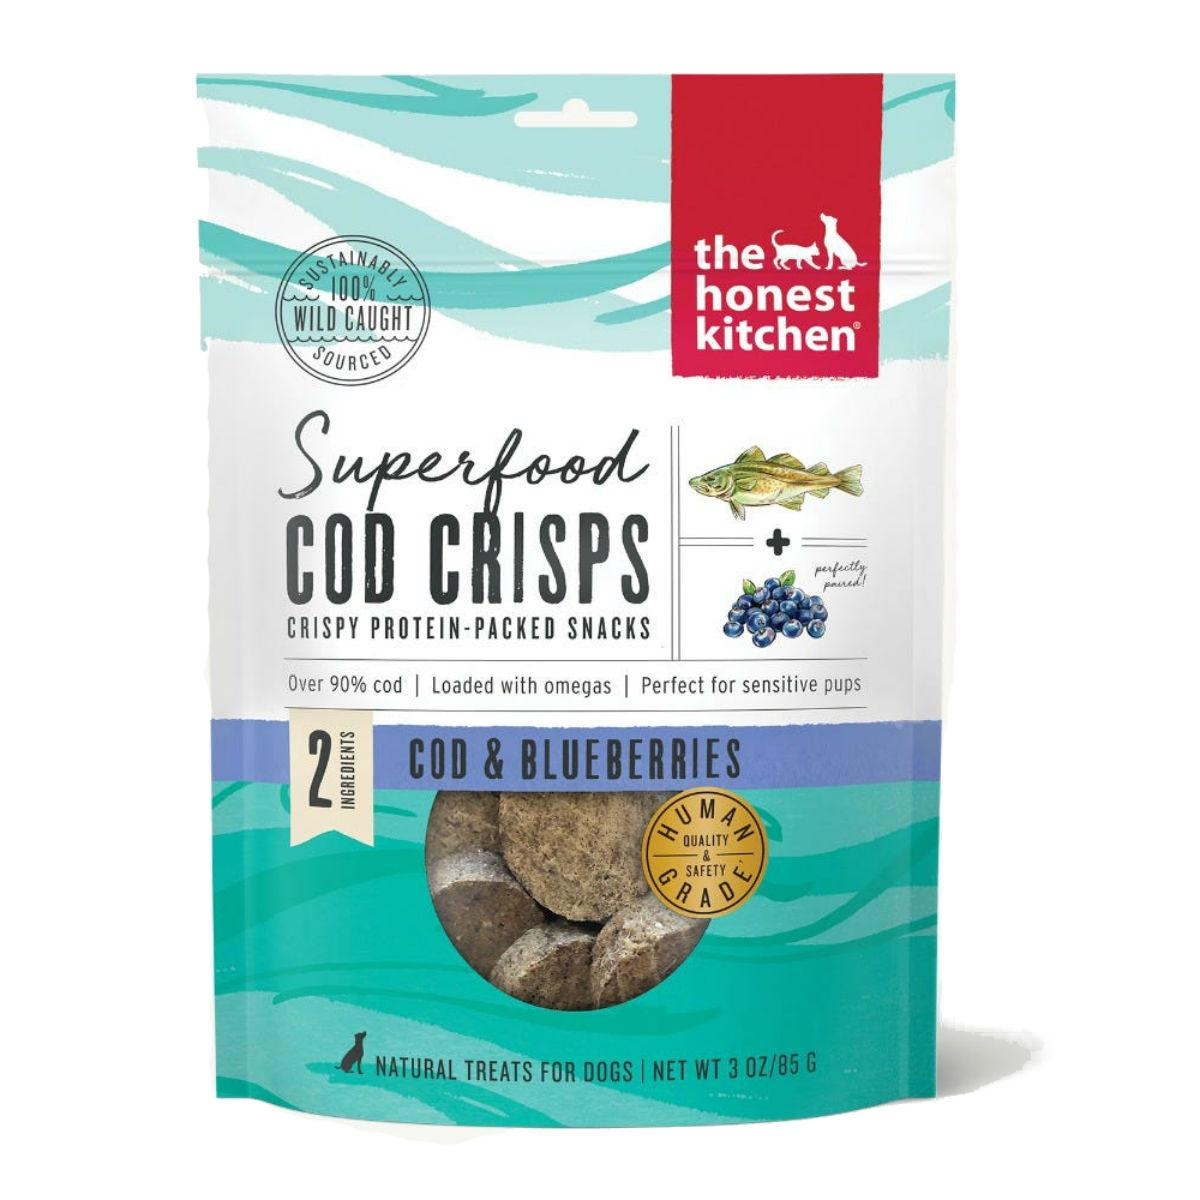 The Honest Kitchen Superfood Cod Crisps Dog Treat - Blueberry